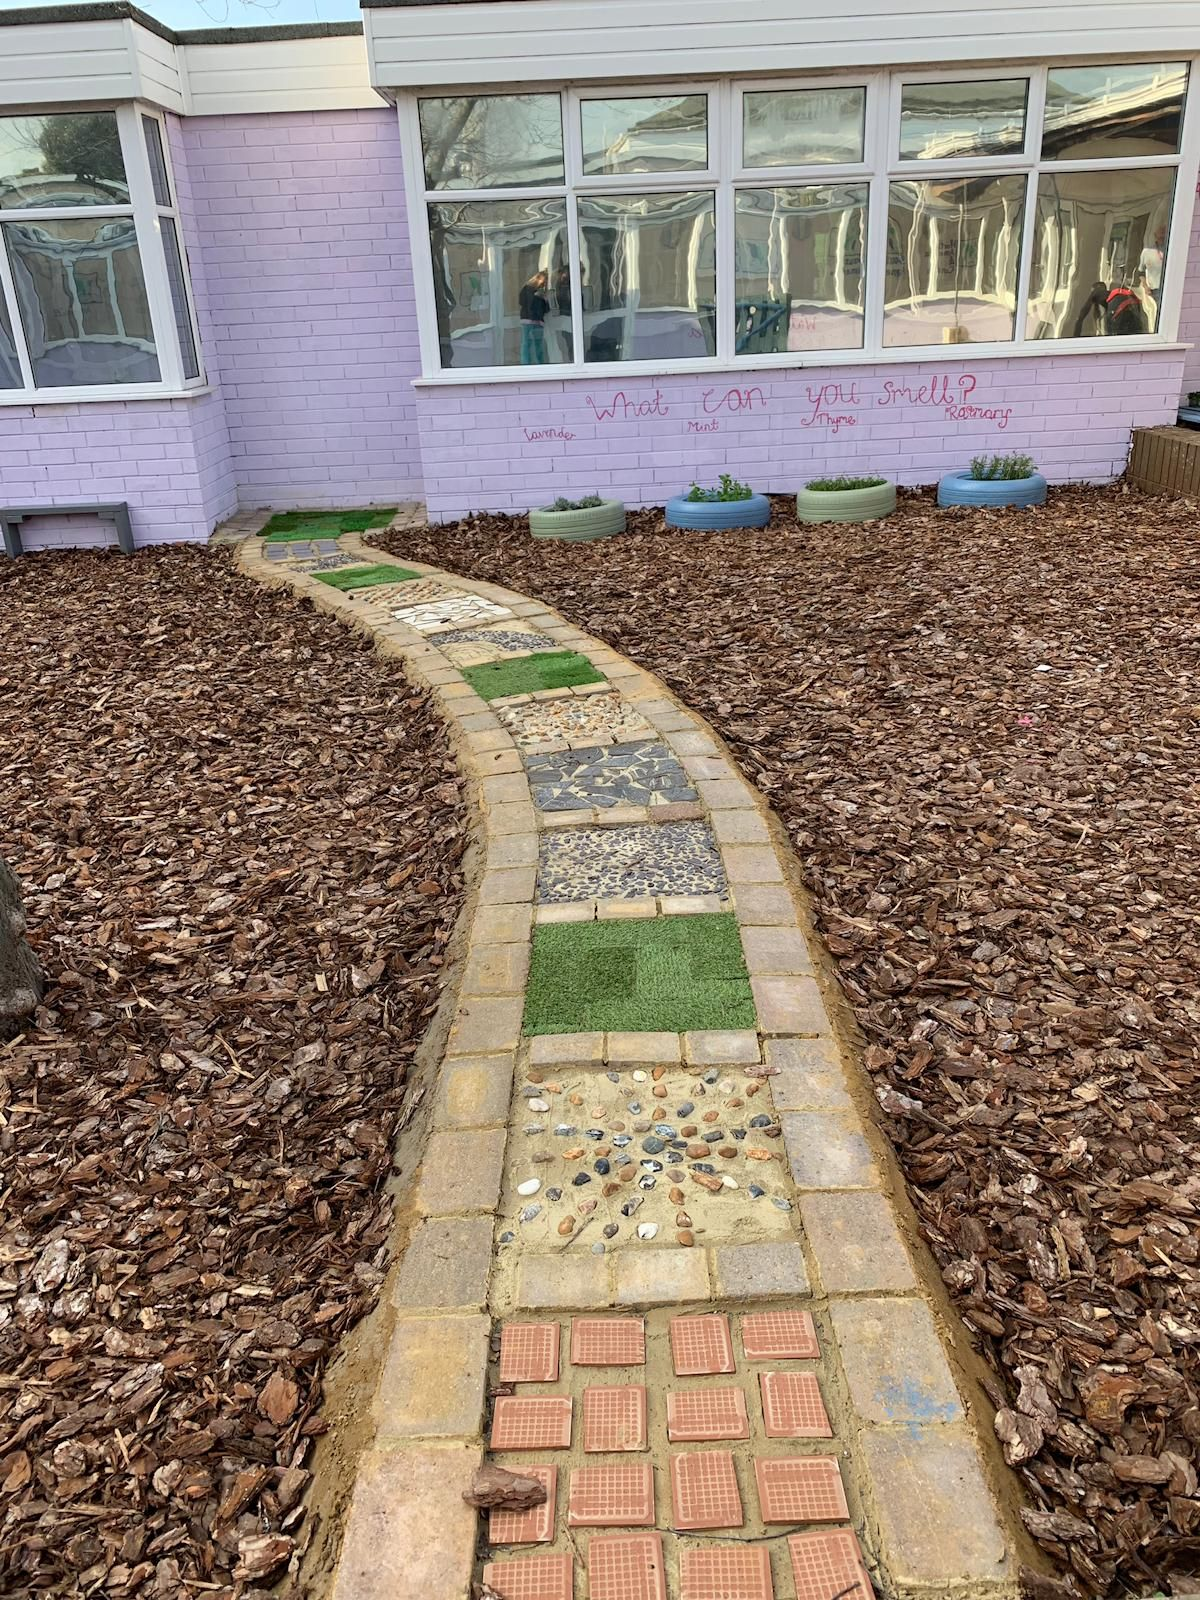 Sensory path | Sensory garden, School garden, Paths